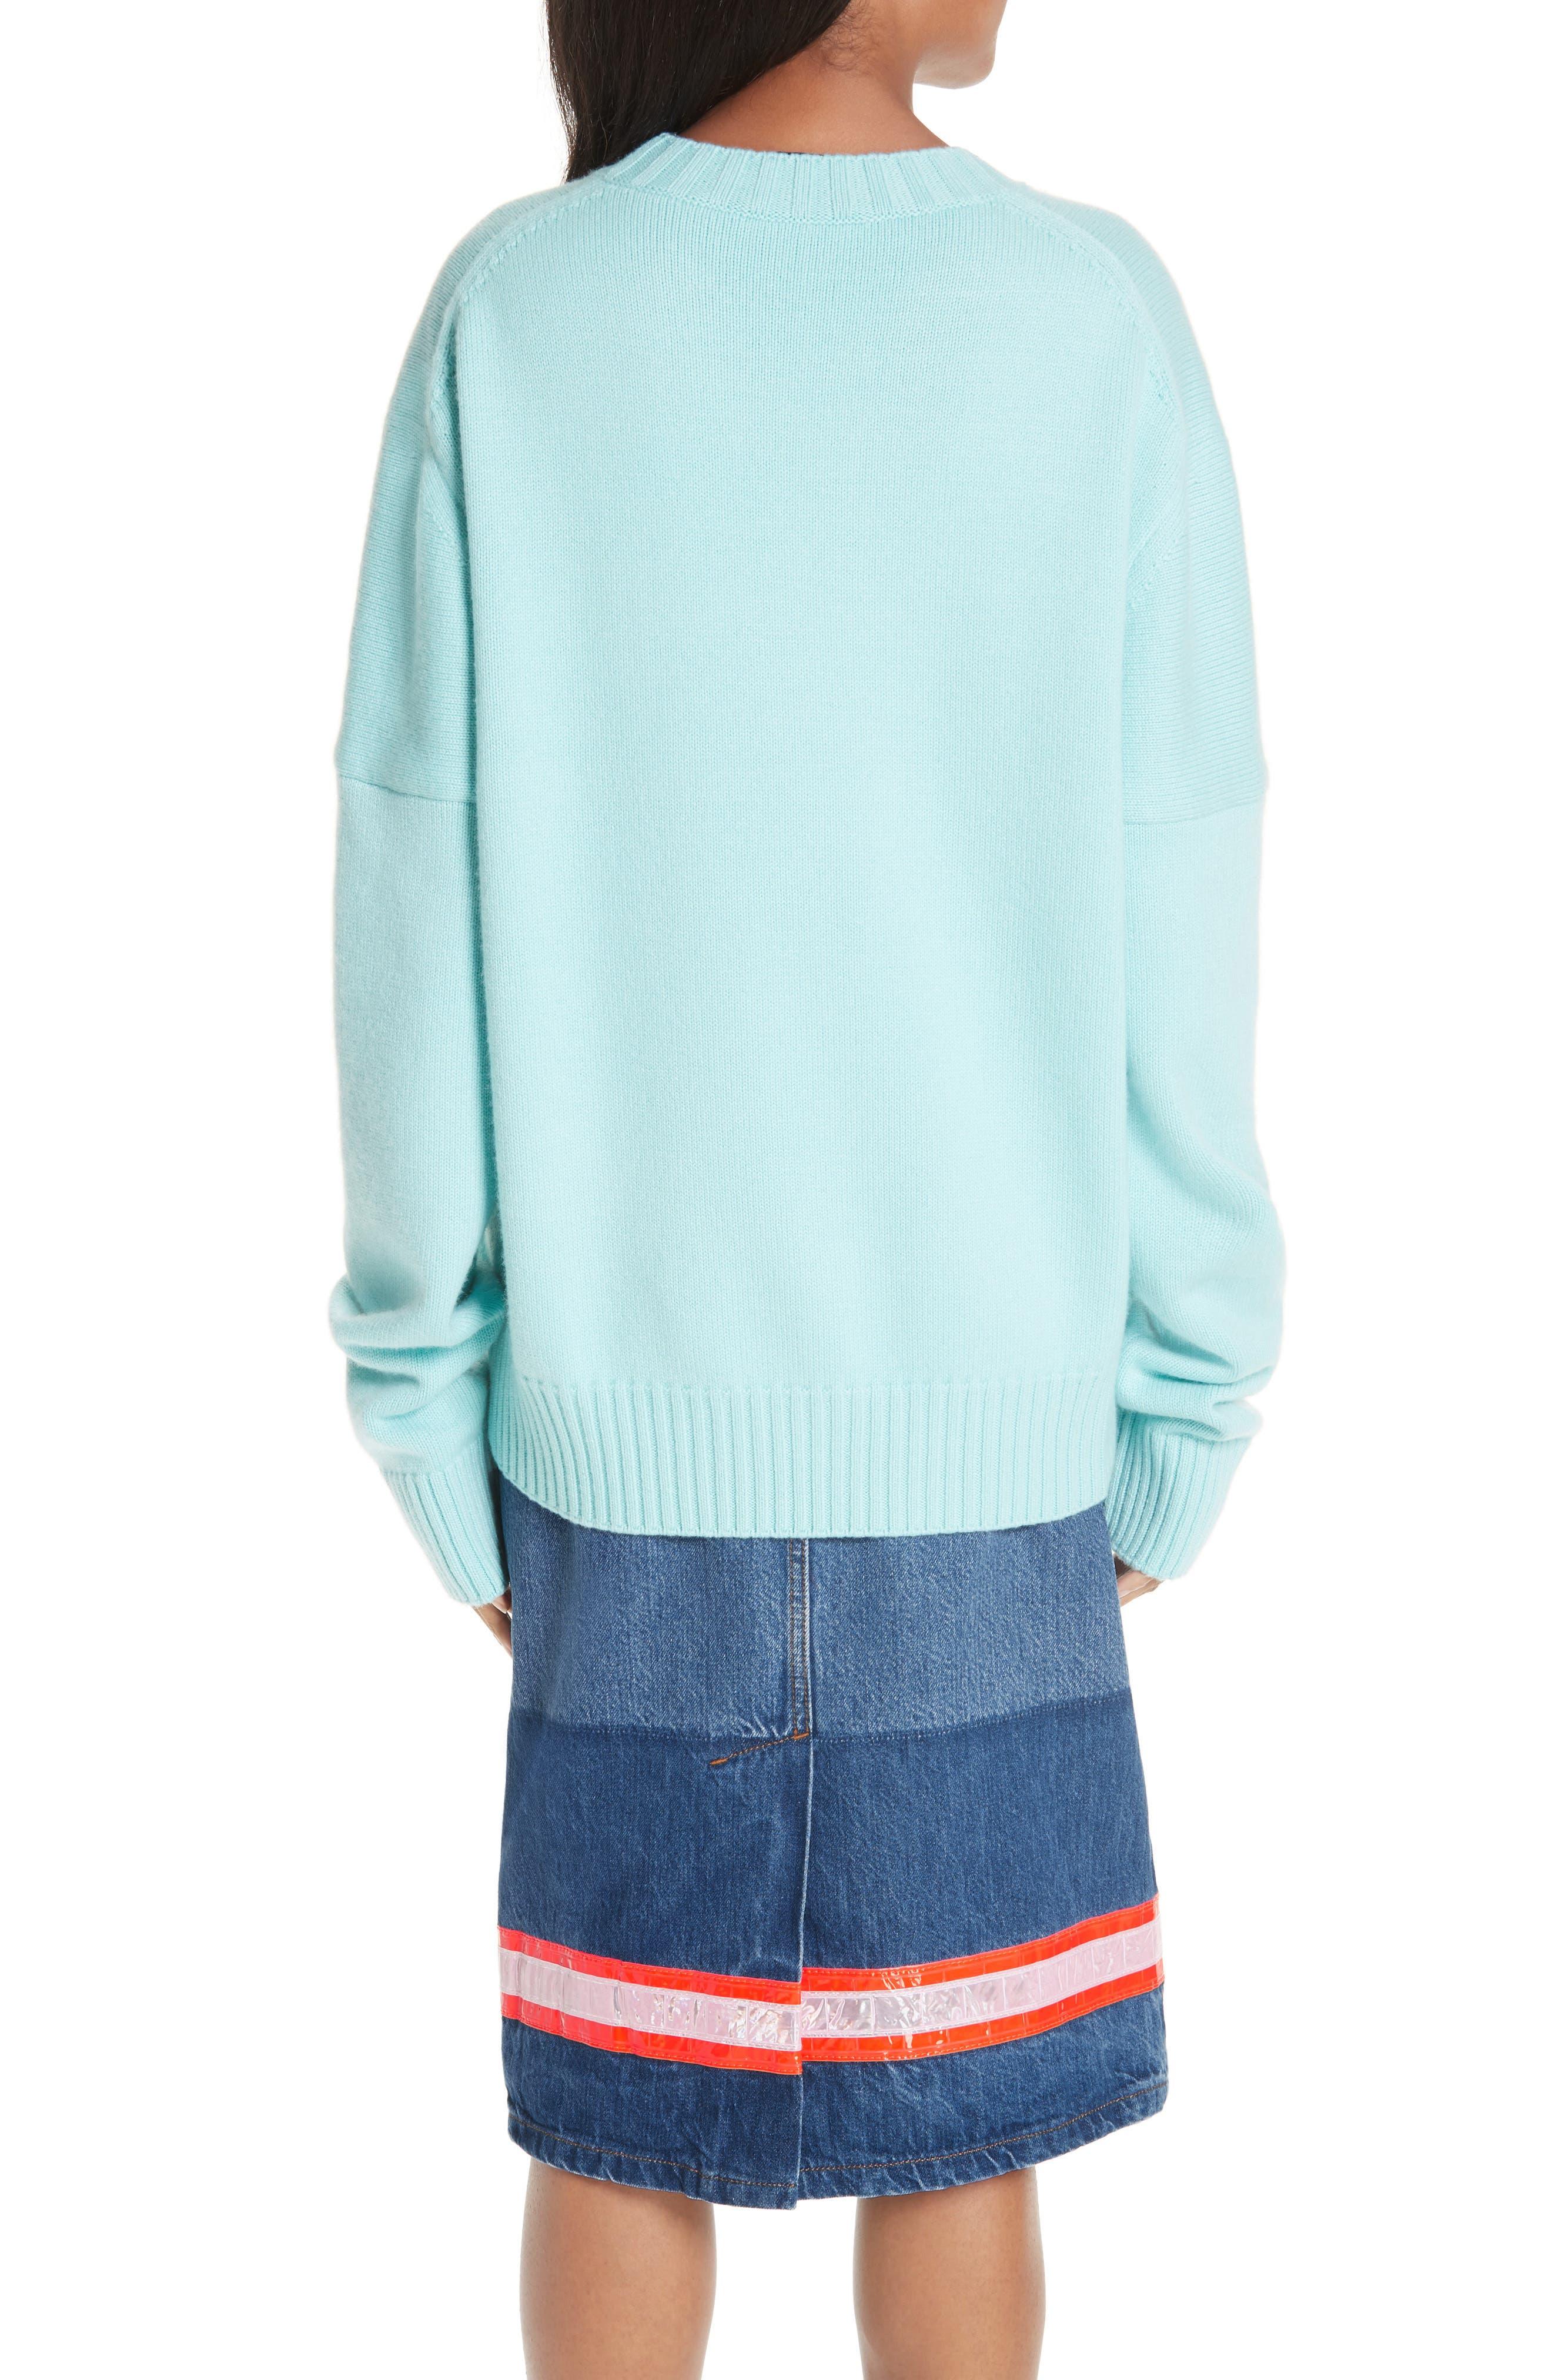 CALVIN KLEIN 205W39NYC, Logo Cashmere Sweater, Alternate thumbnail 2, color, SKY BLUE